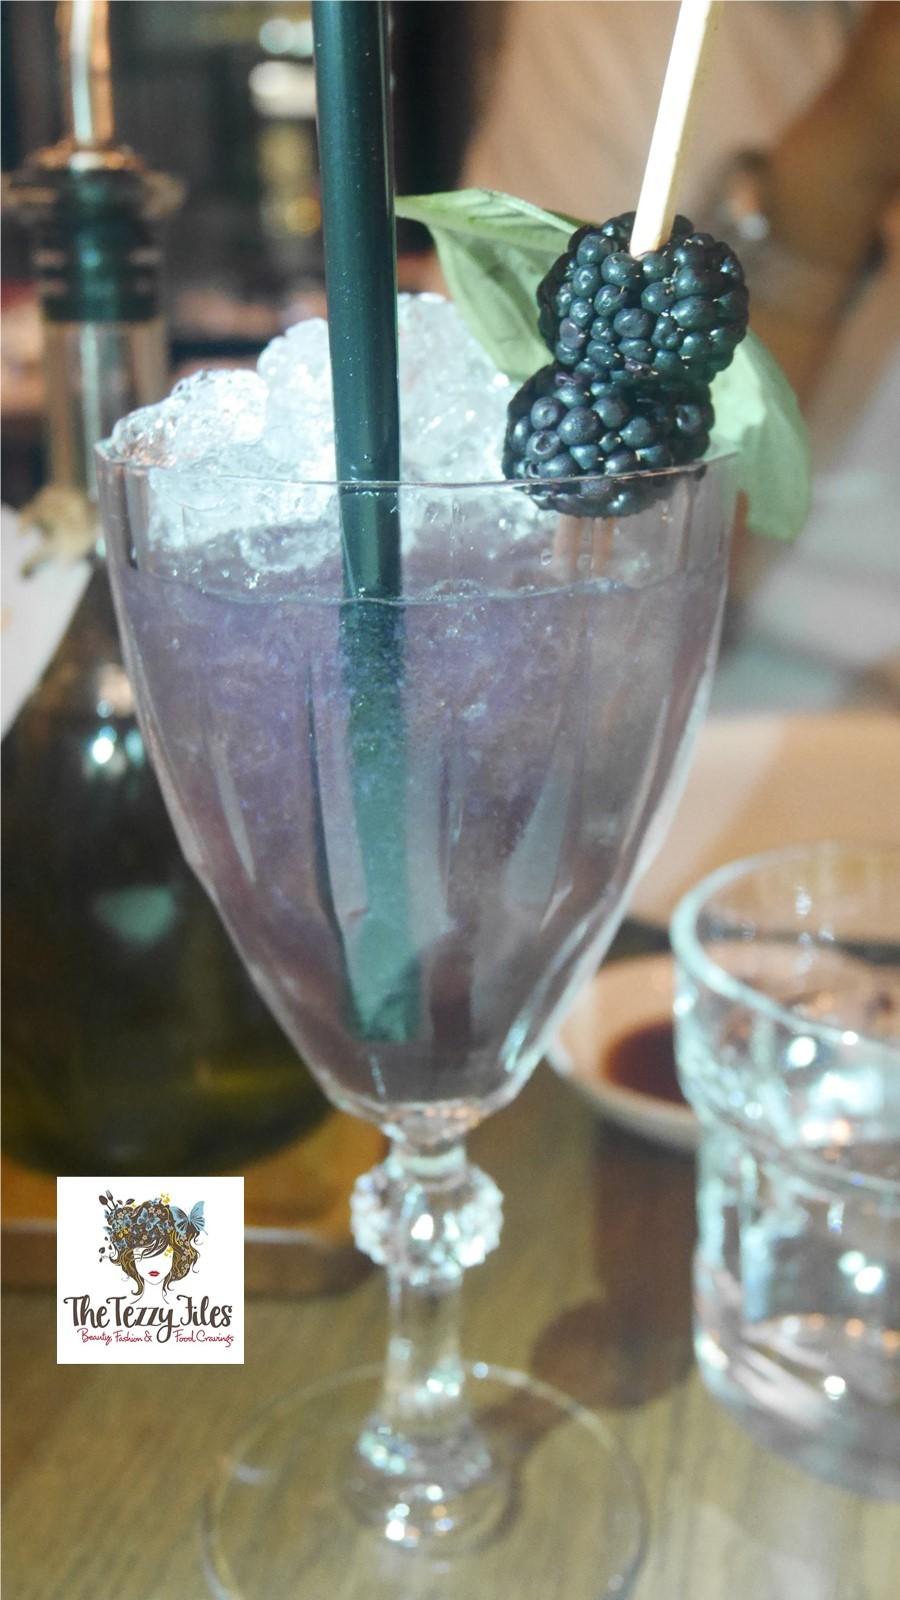 Matto Dubai Italian The Oberoi Business Bay Italian Food Review (7)